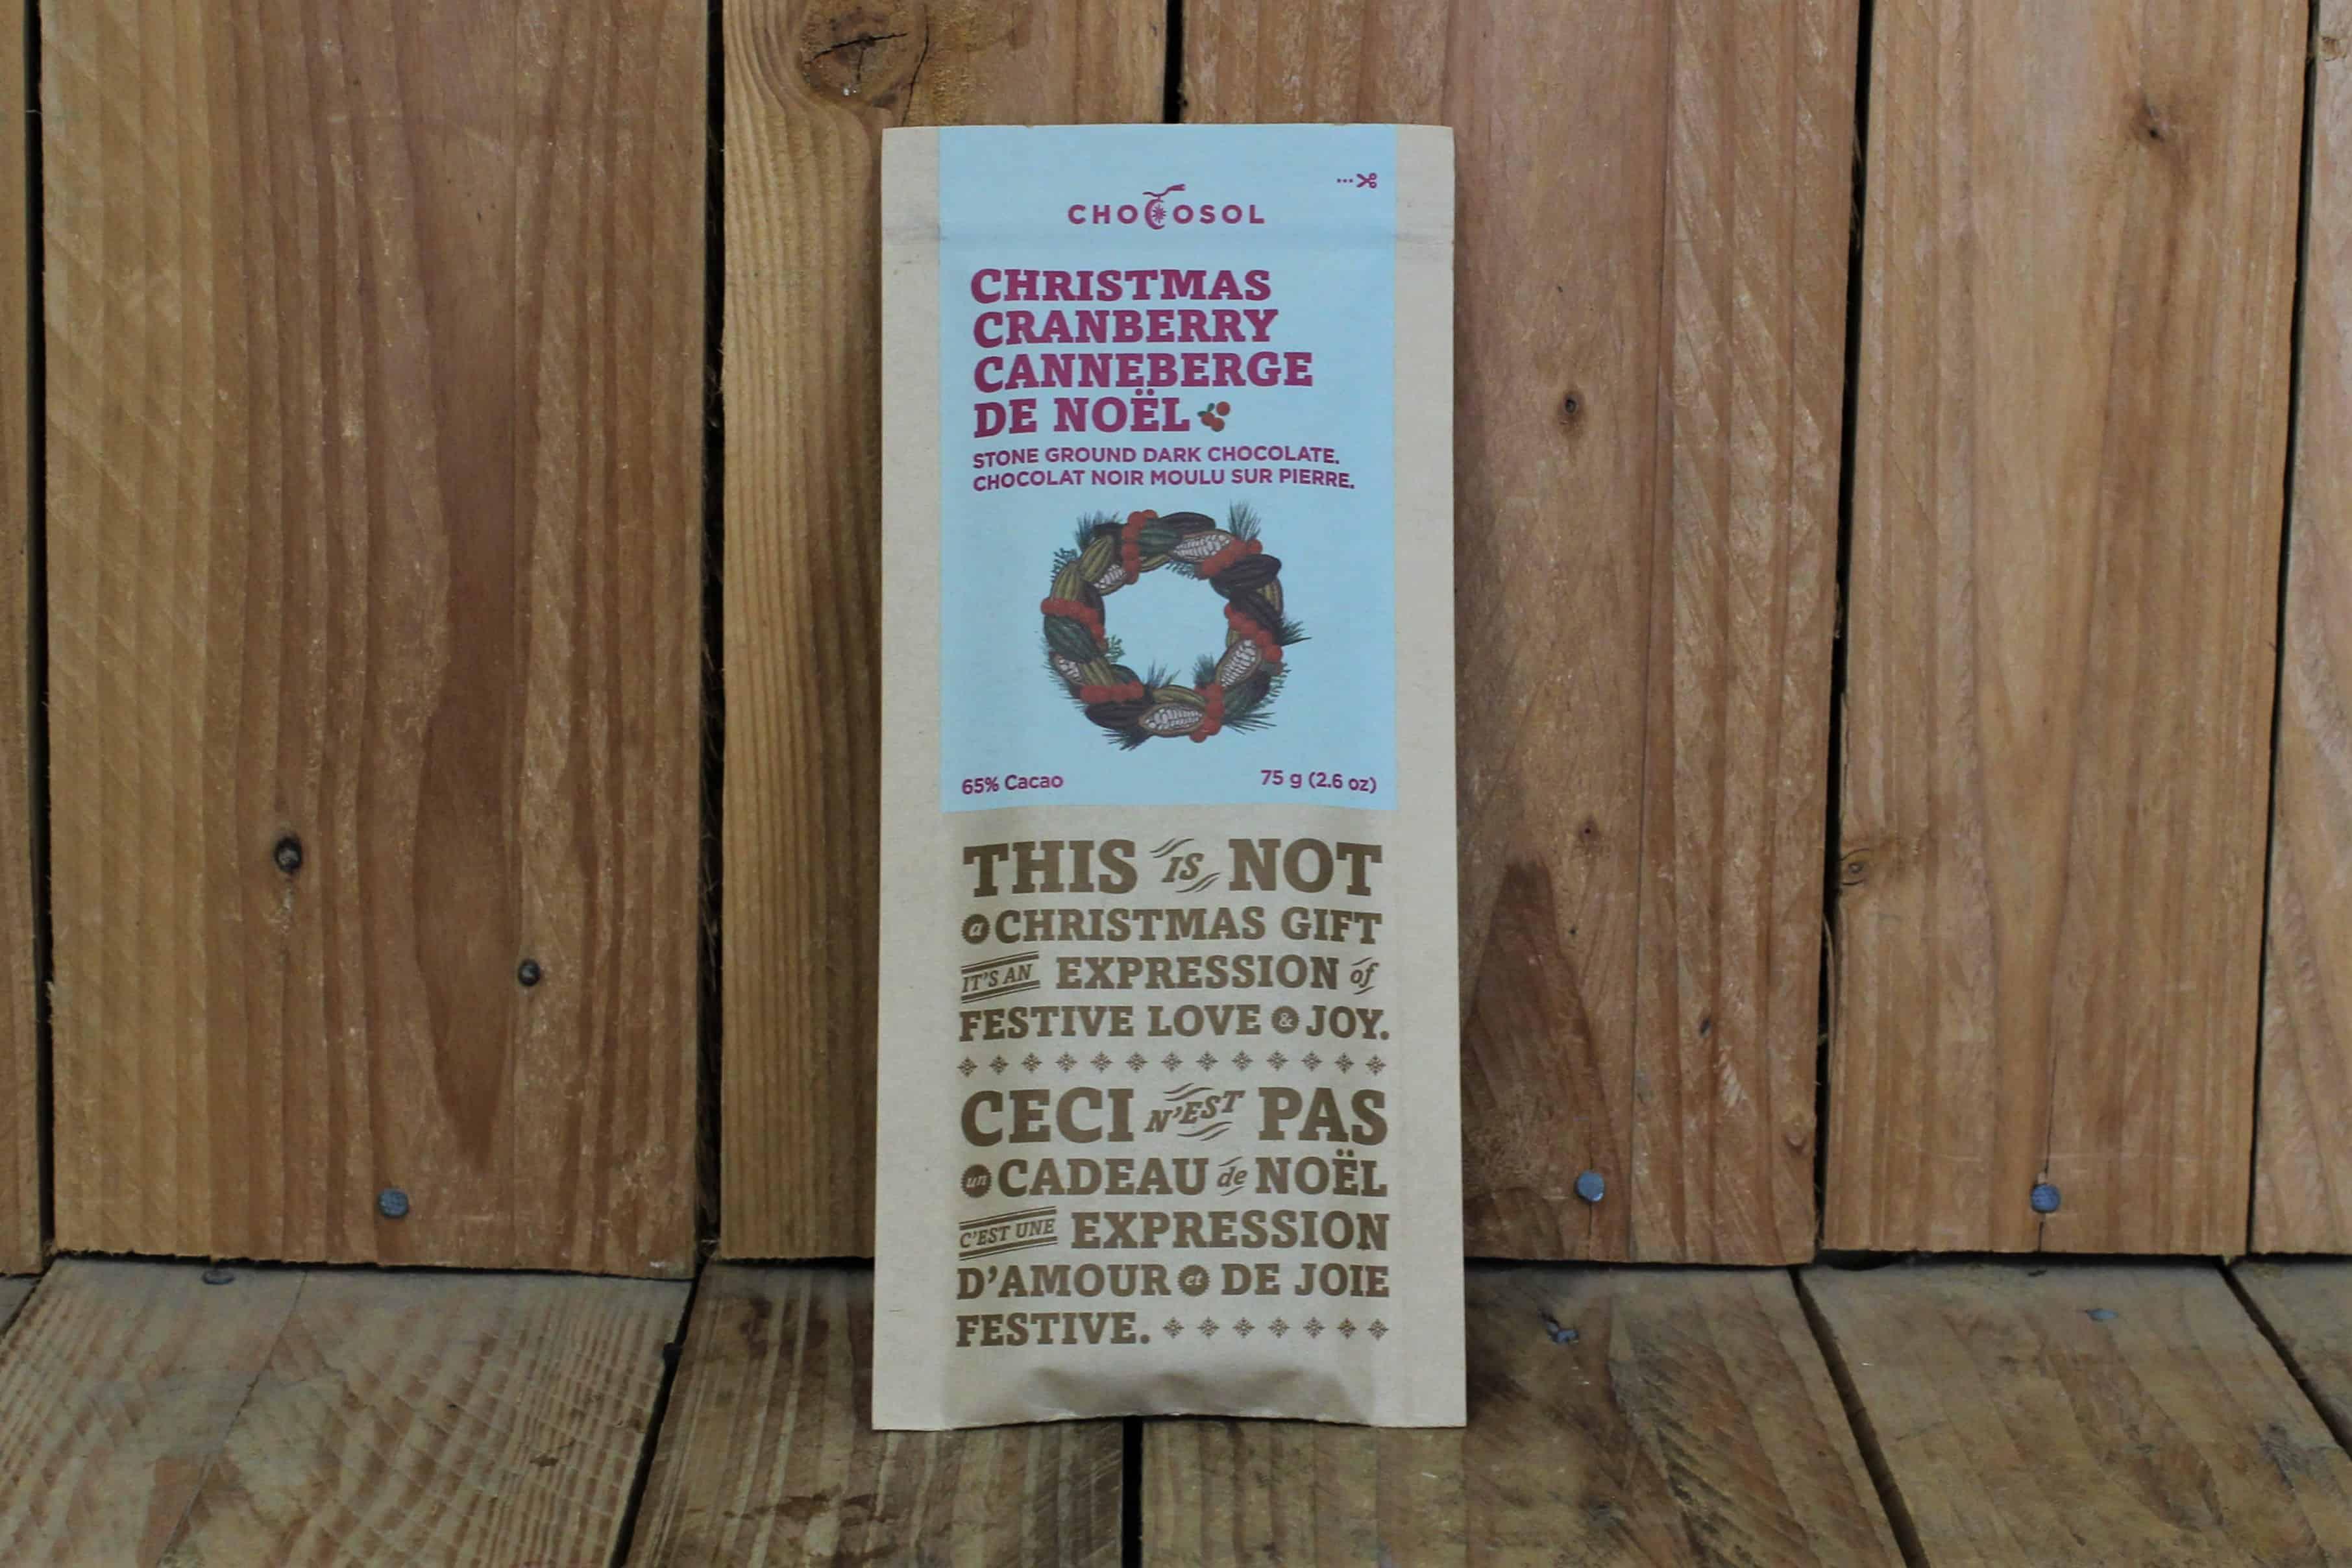 Chocosol – Christmas Cranberry + 65% Dark Chocolate Bar (75g)